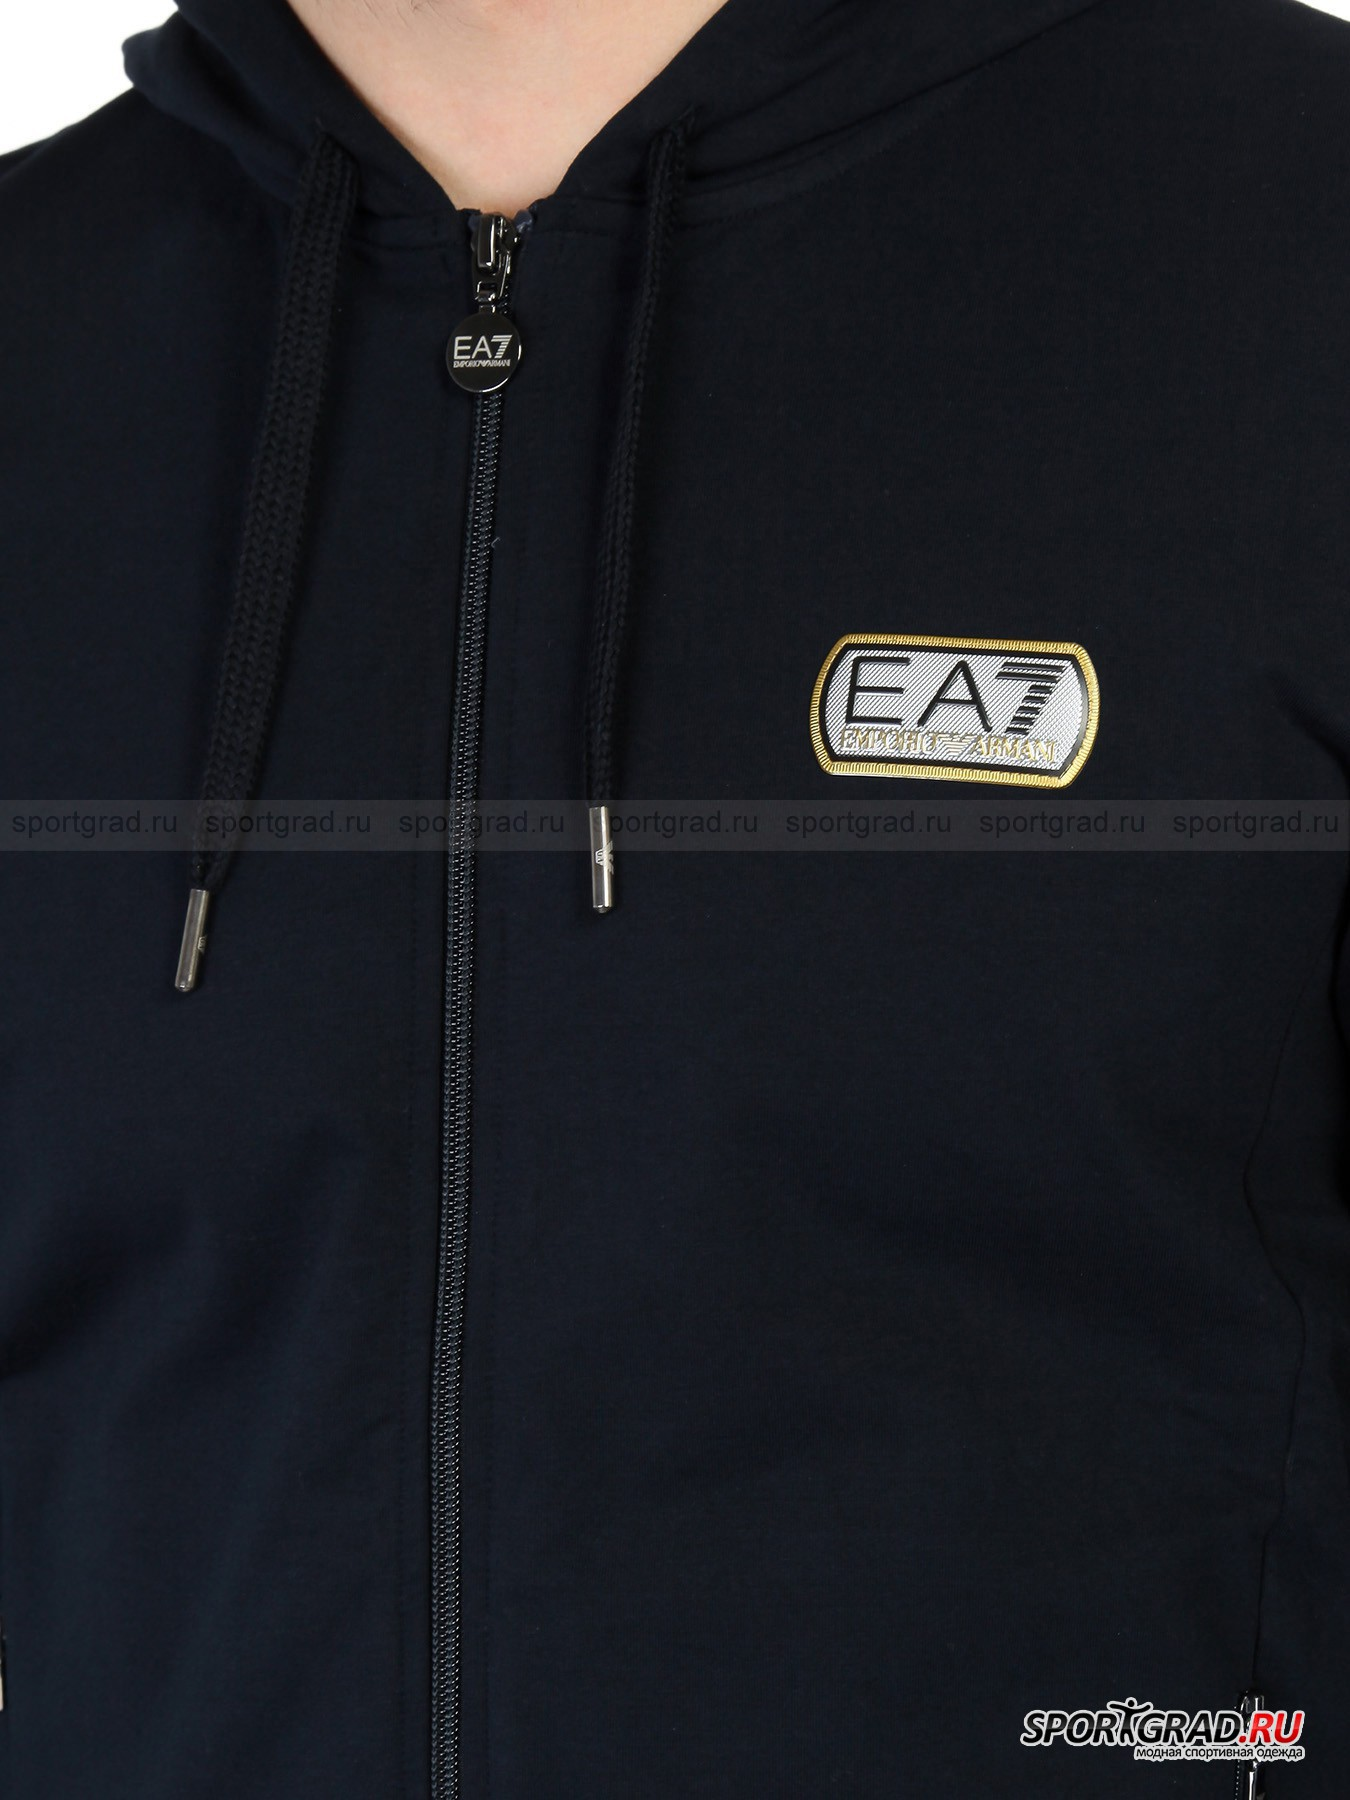 Толстовка мужская Train Lux Hoodie Sweatshirt EA7 Emporio Armani от Спортград